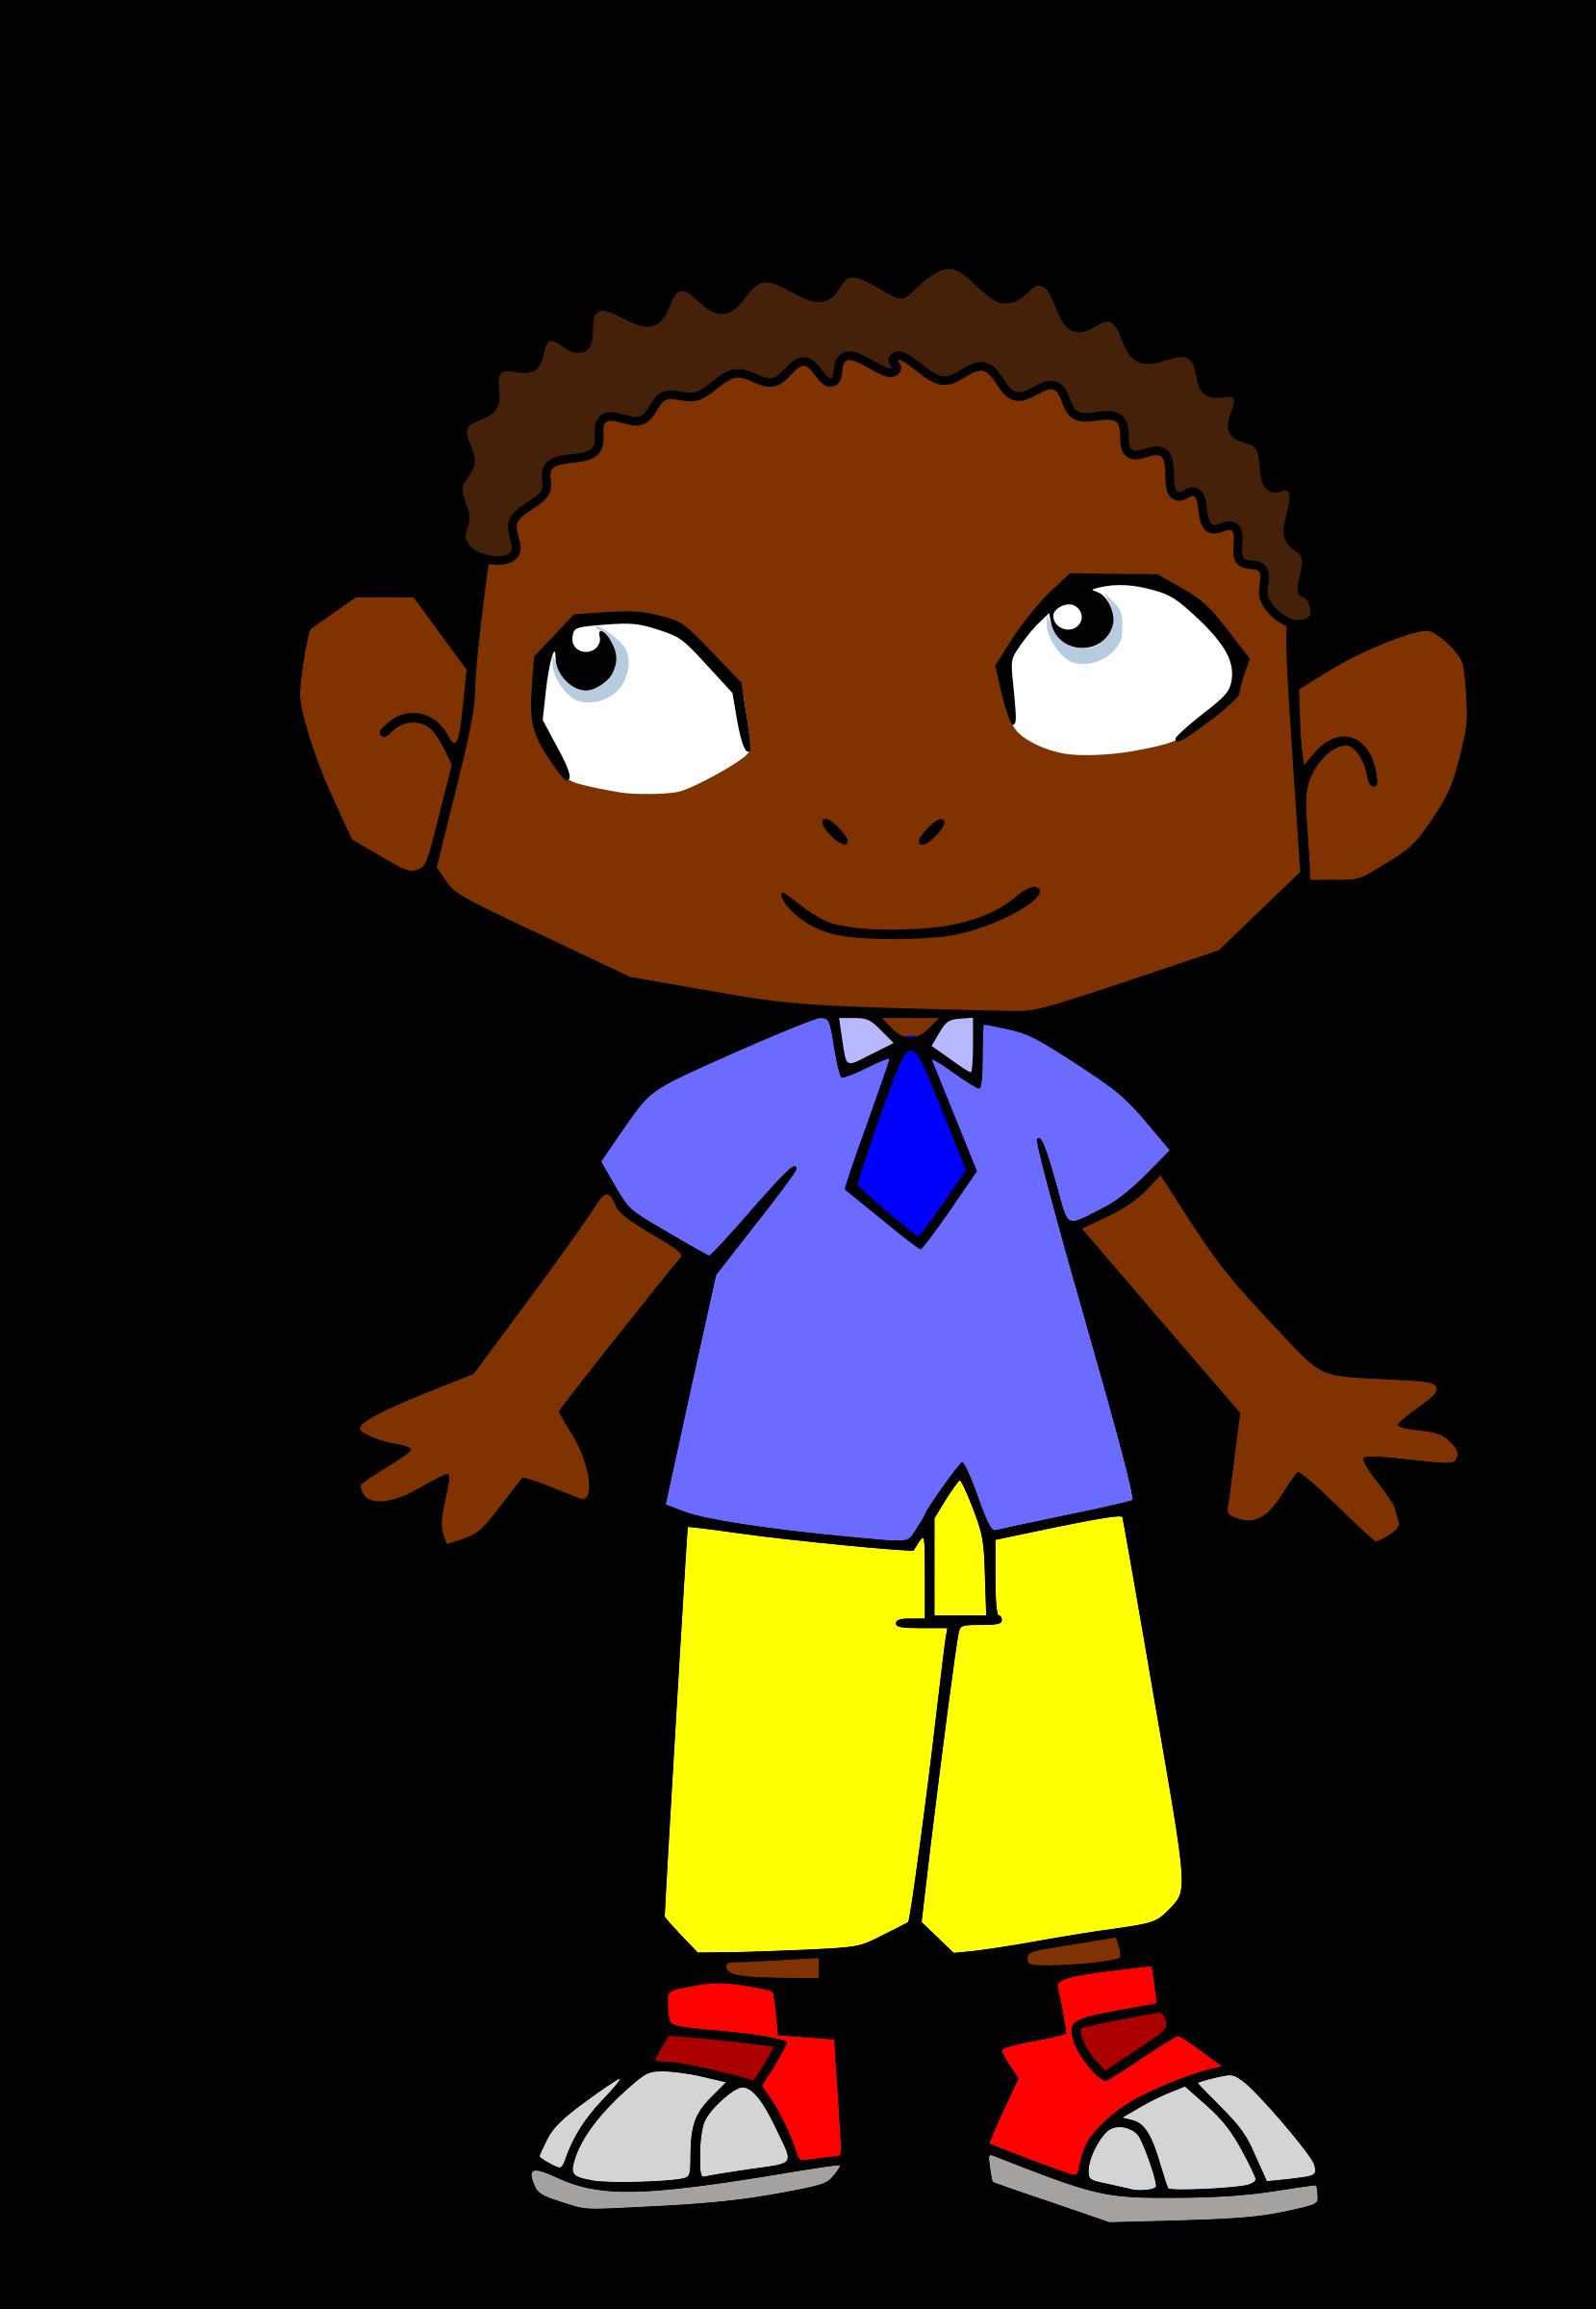 image transparent stock Cartoon boy with rather. Africa clipart creative